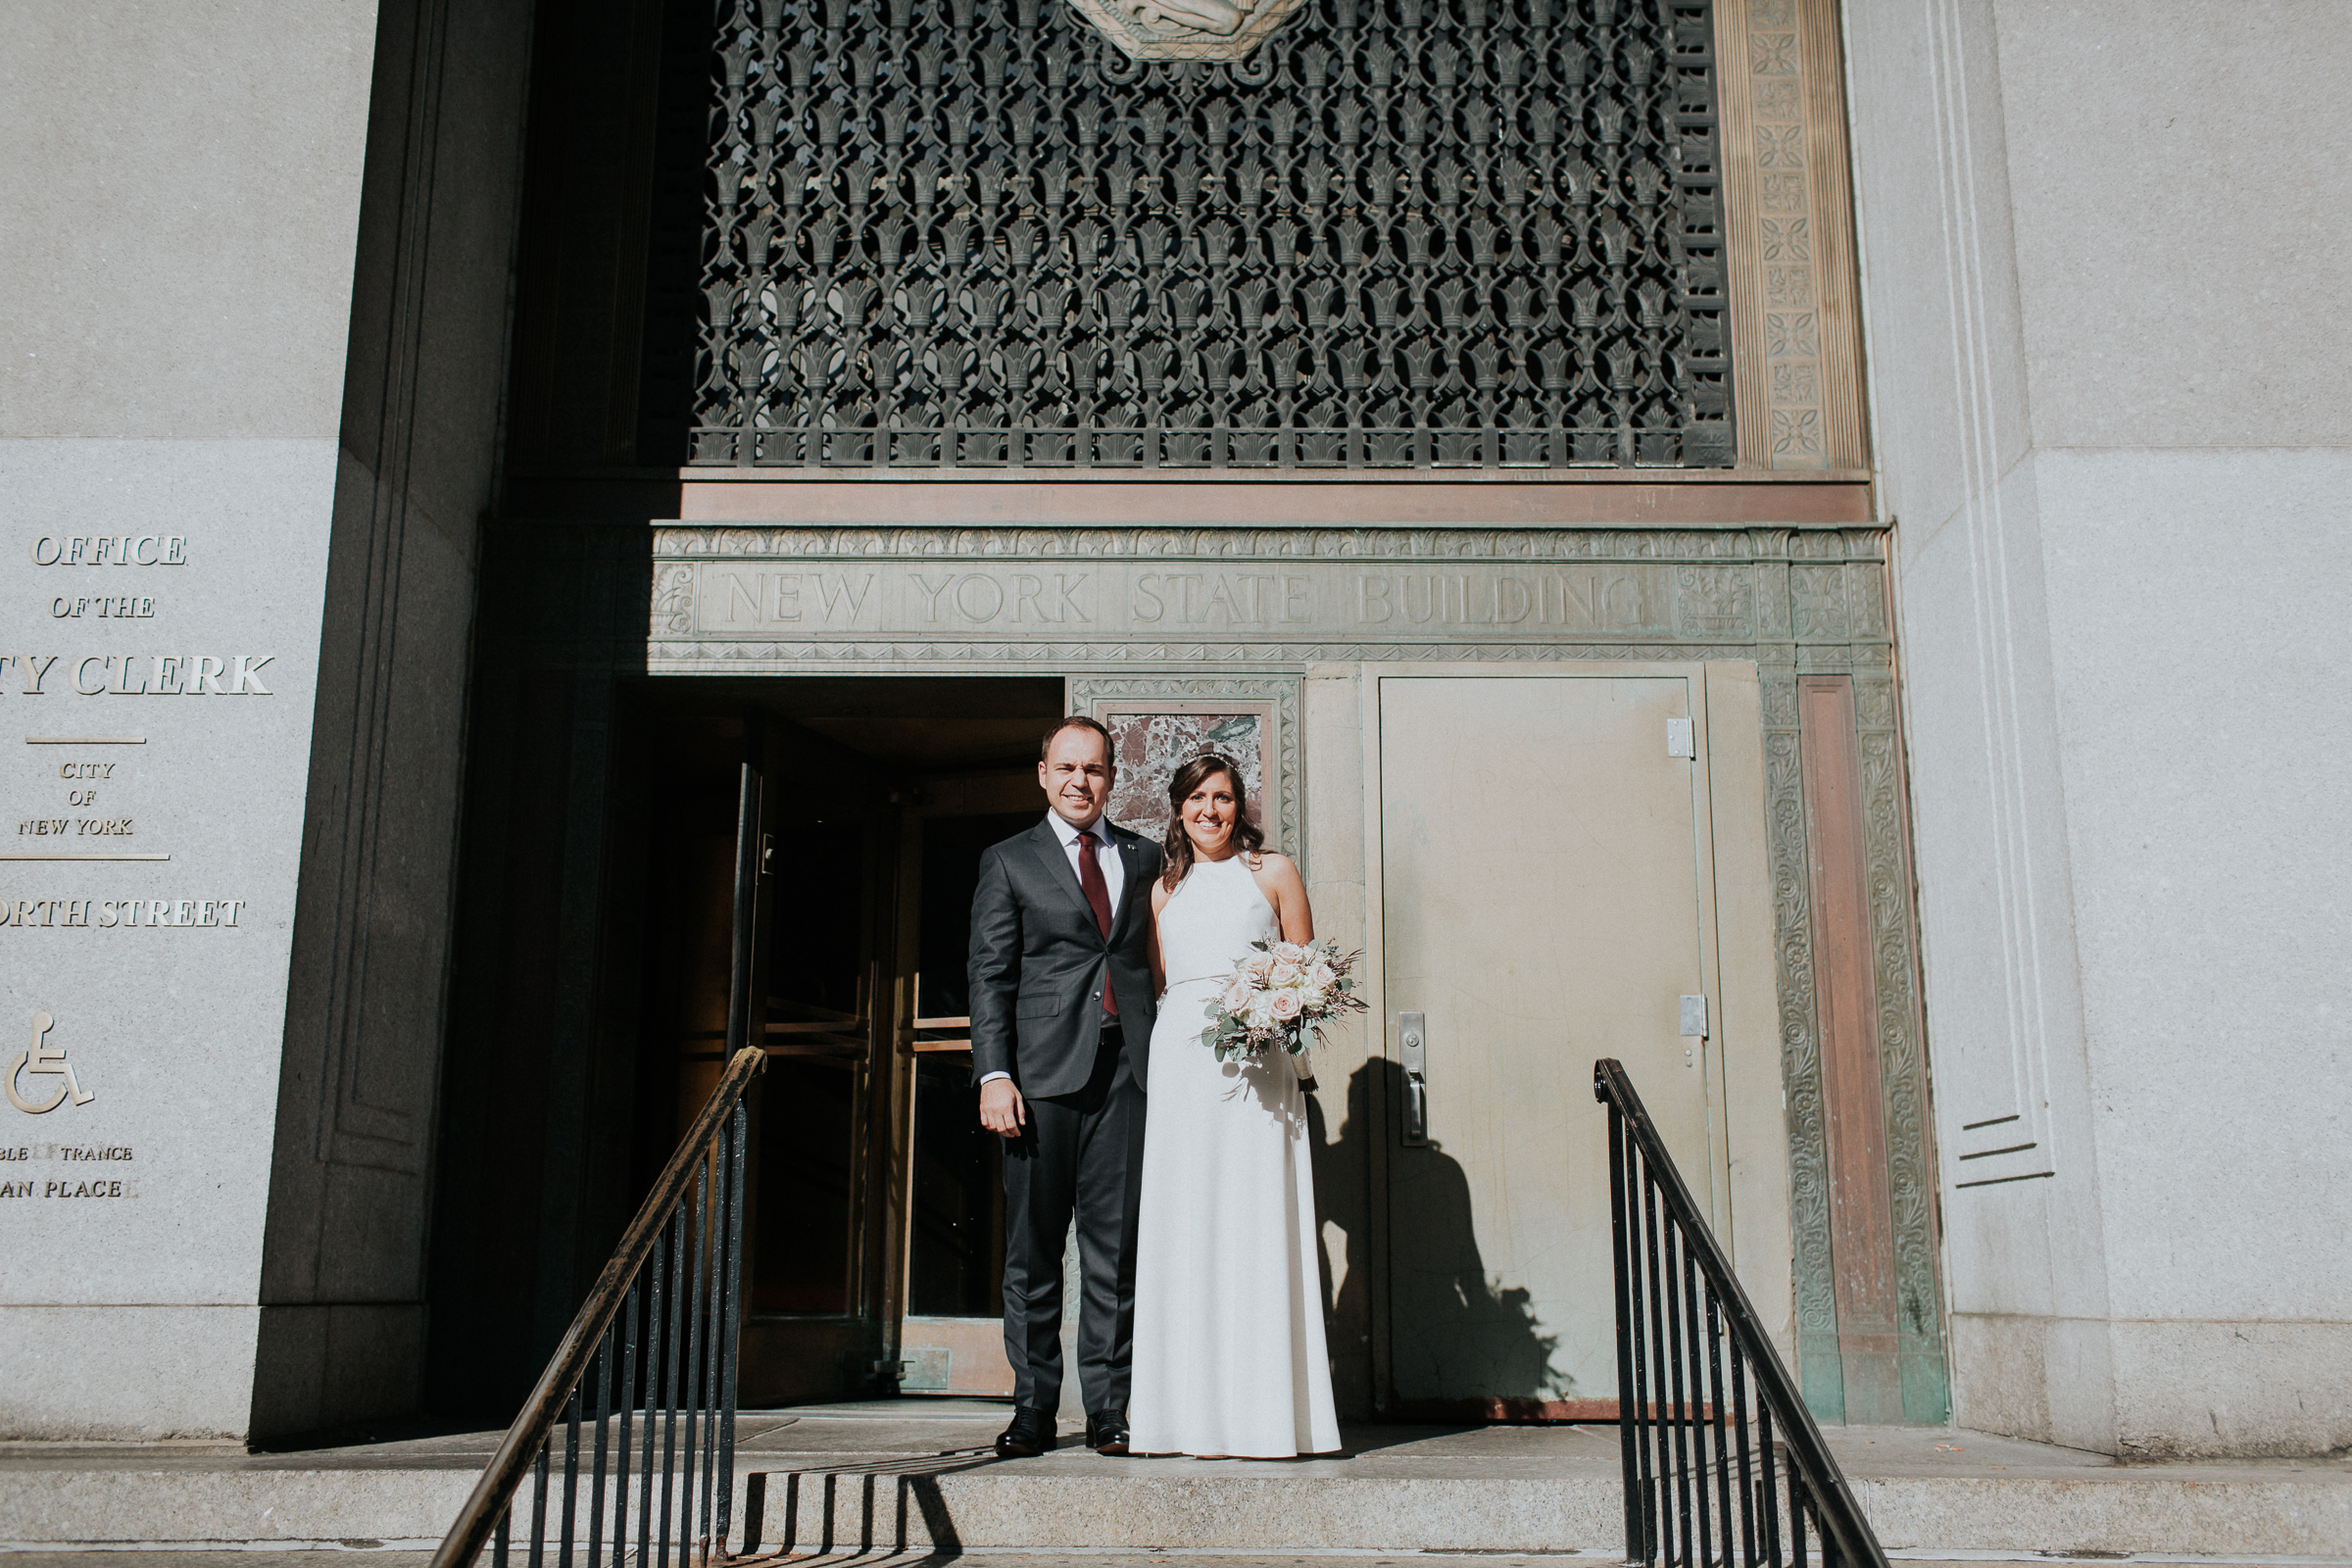 Casa-Apicii-Intimate-Wedding-City-Hall-Elopement-New-York-Documentary-Wedding-Photographer-16.jpg